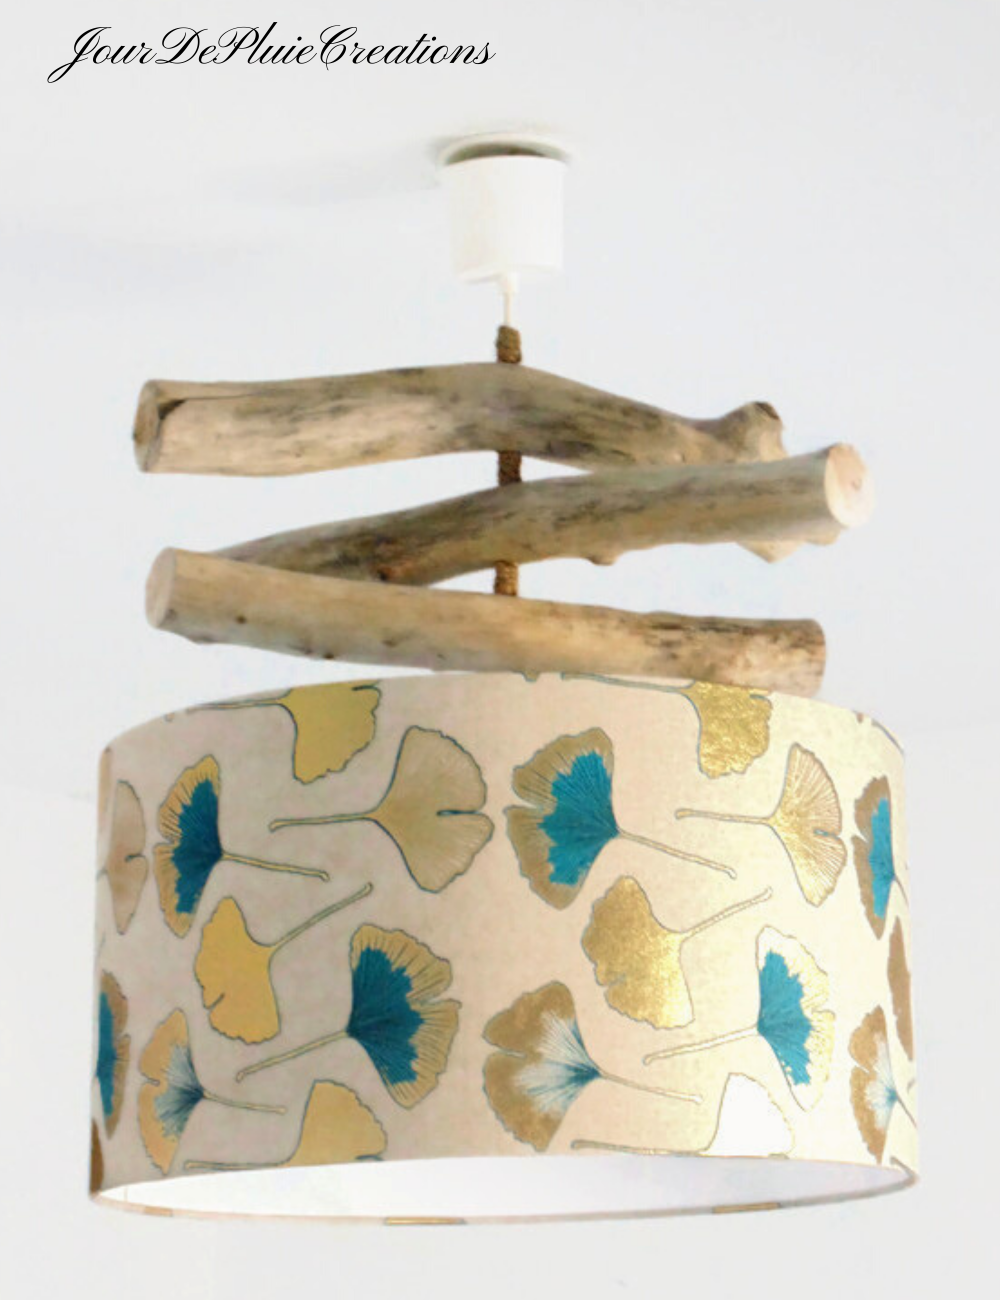 Lustre bois flotté abat jour esprit lin motifs feuilles ginkgo biloba bleu 45 cm - plafonnier rond - idée cadeau no